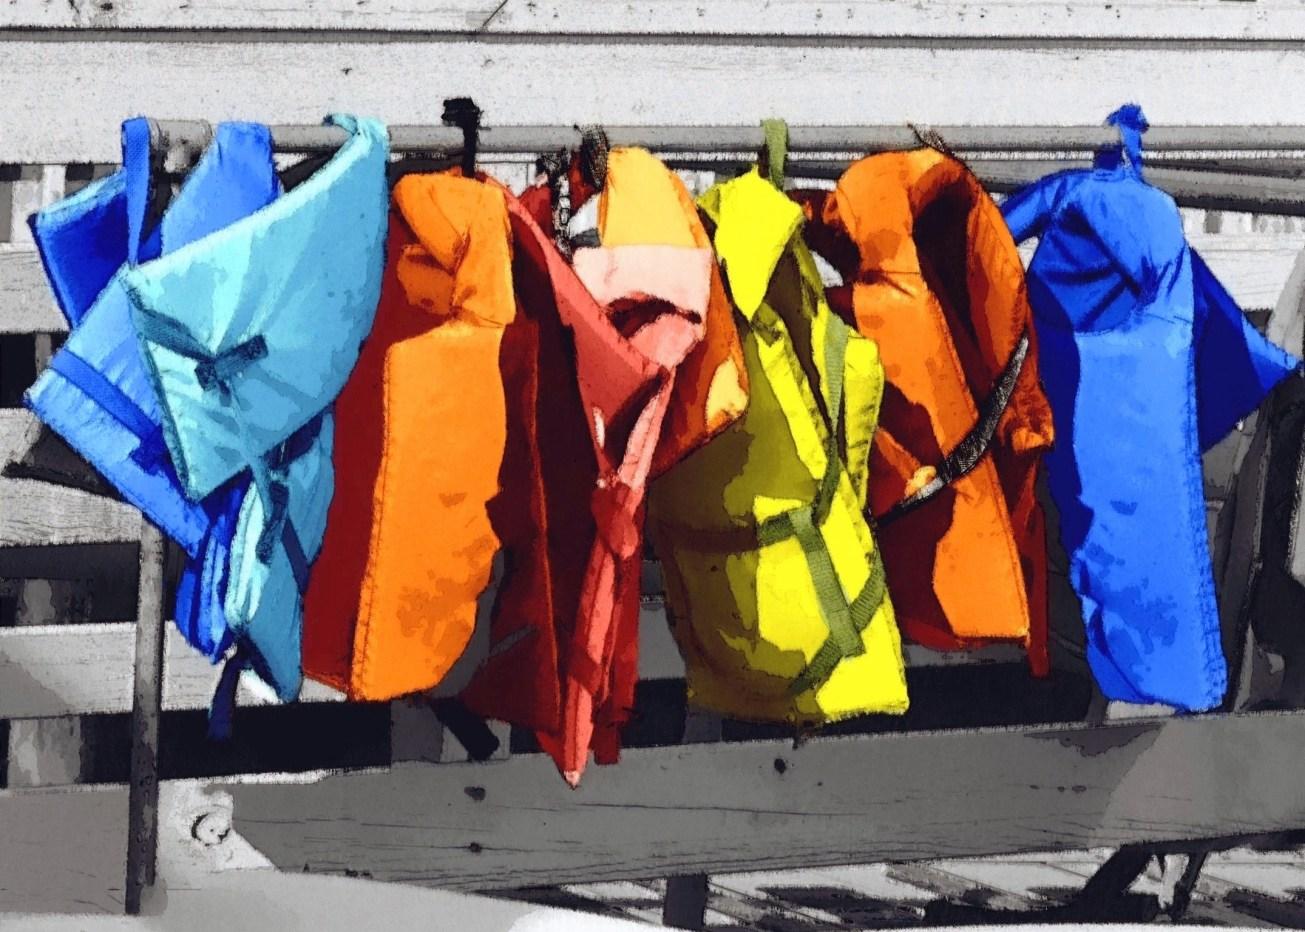 IMG_7865-001 gall life jackets